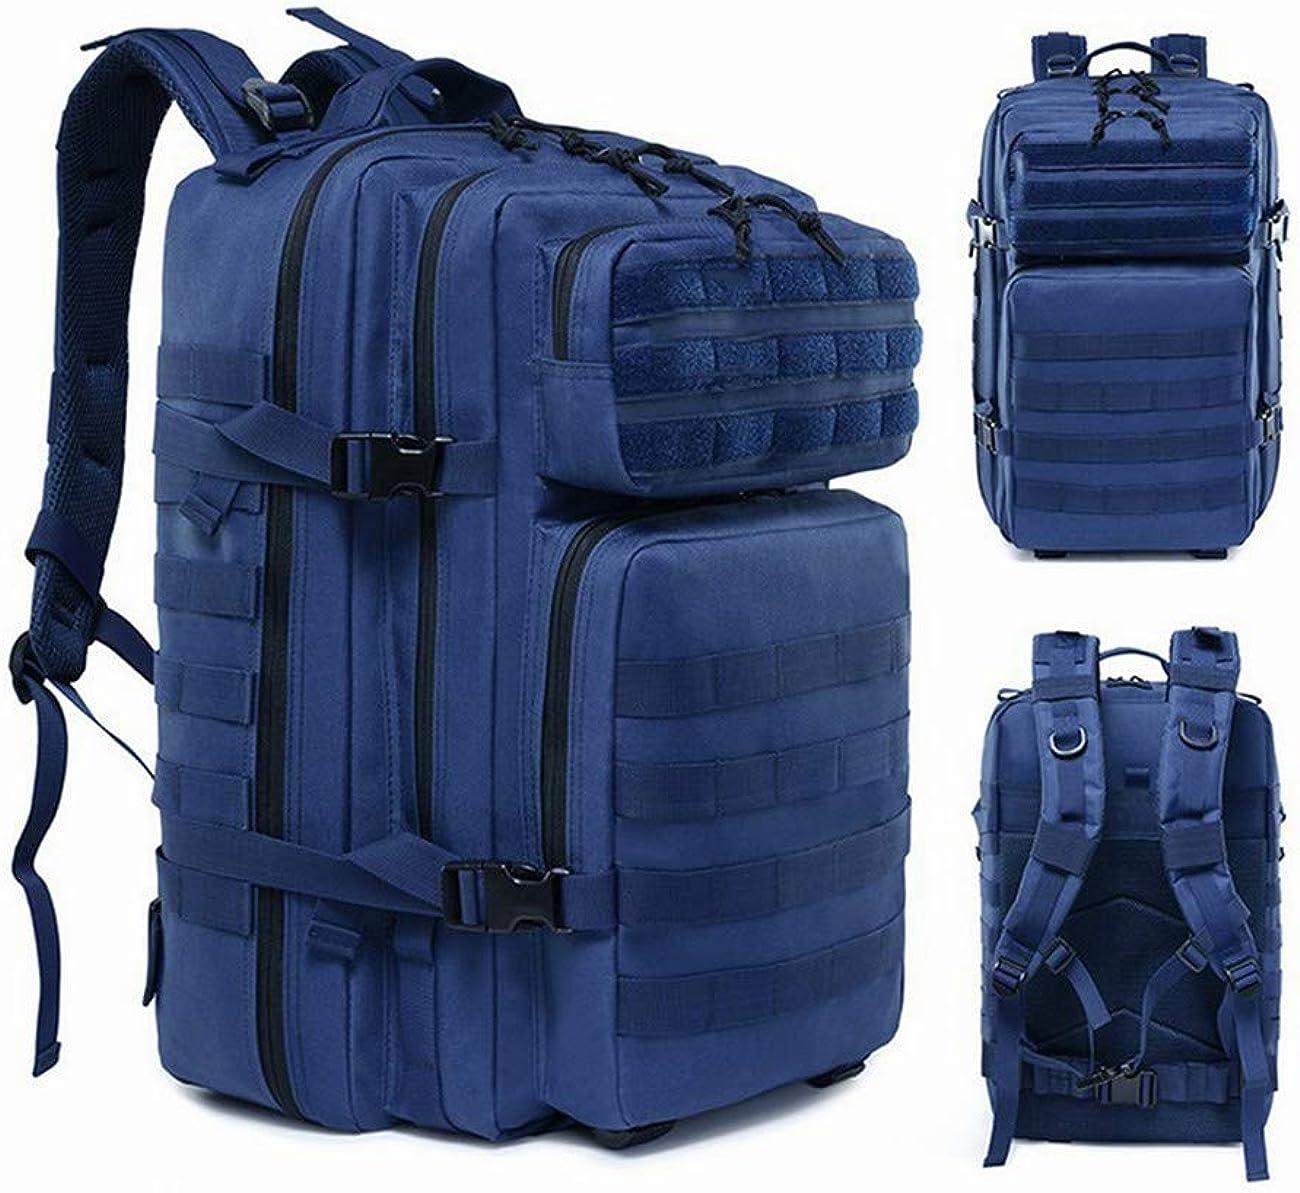 45L Large Mens Waterproof Backpack Unisex Rucksack Hiking Camping Bag Travel UK